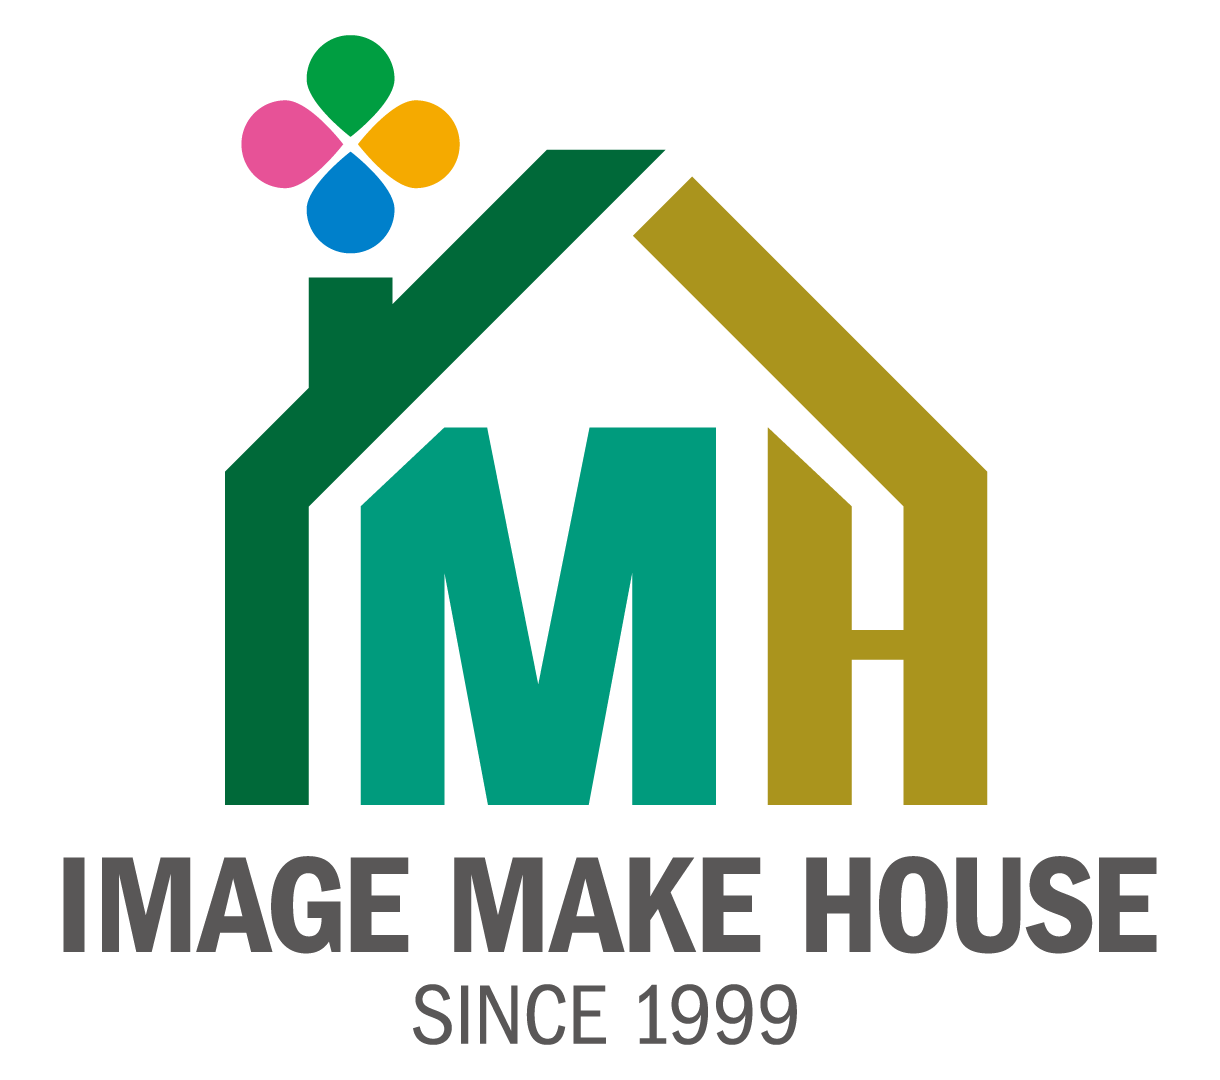 IMAGE MAKE HOUSE